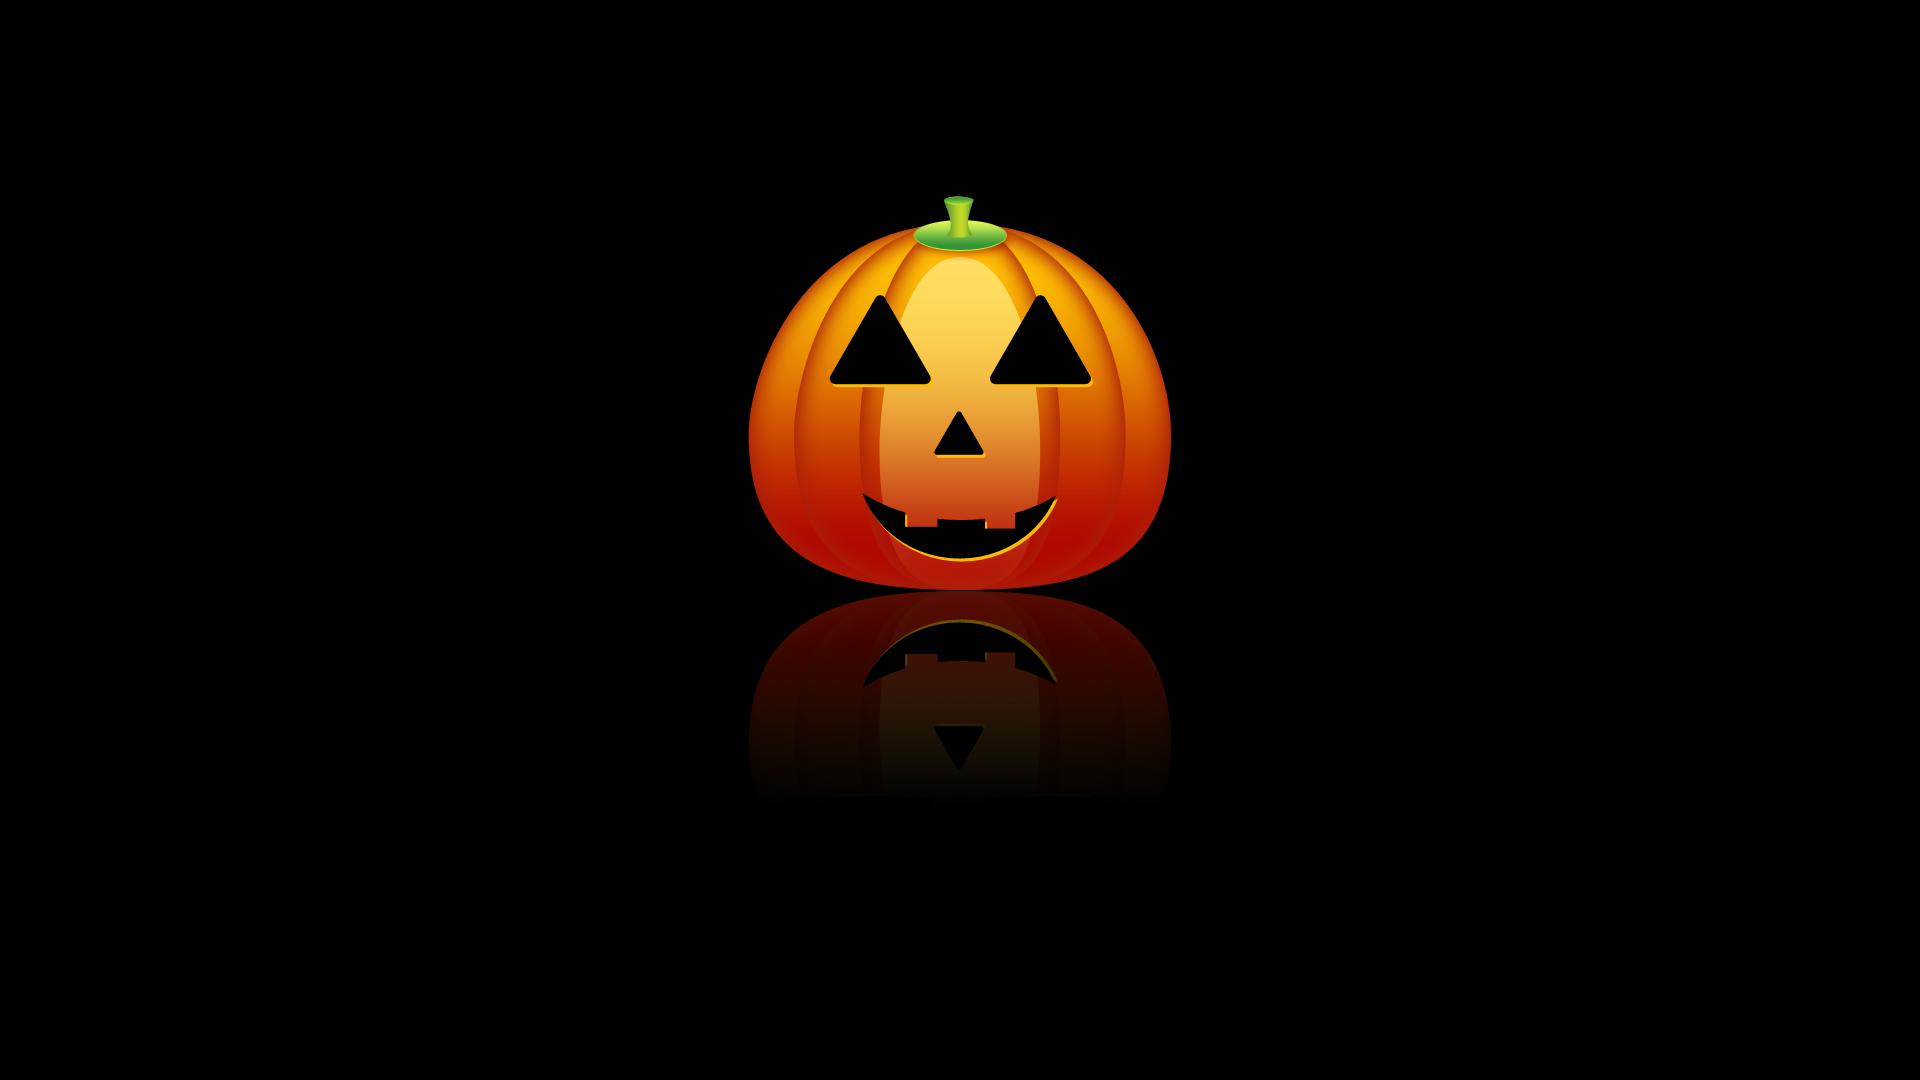 Wallpaper Halloween Minimalism Reflection Pumpkin